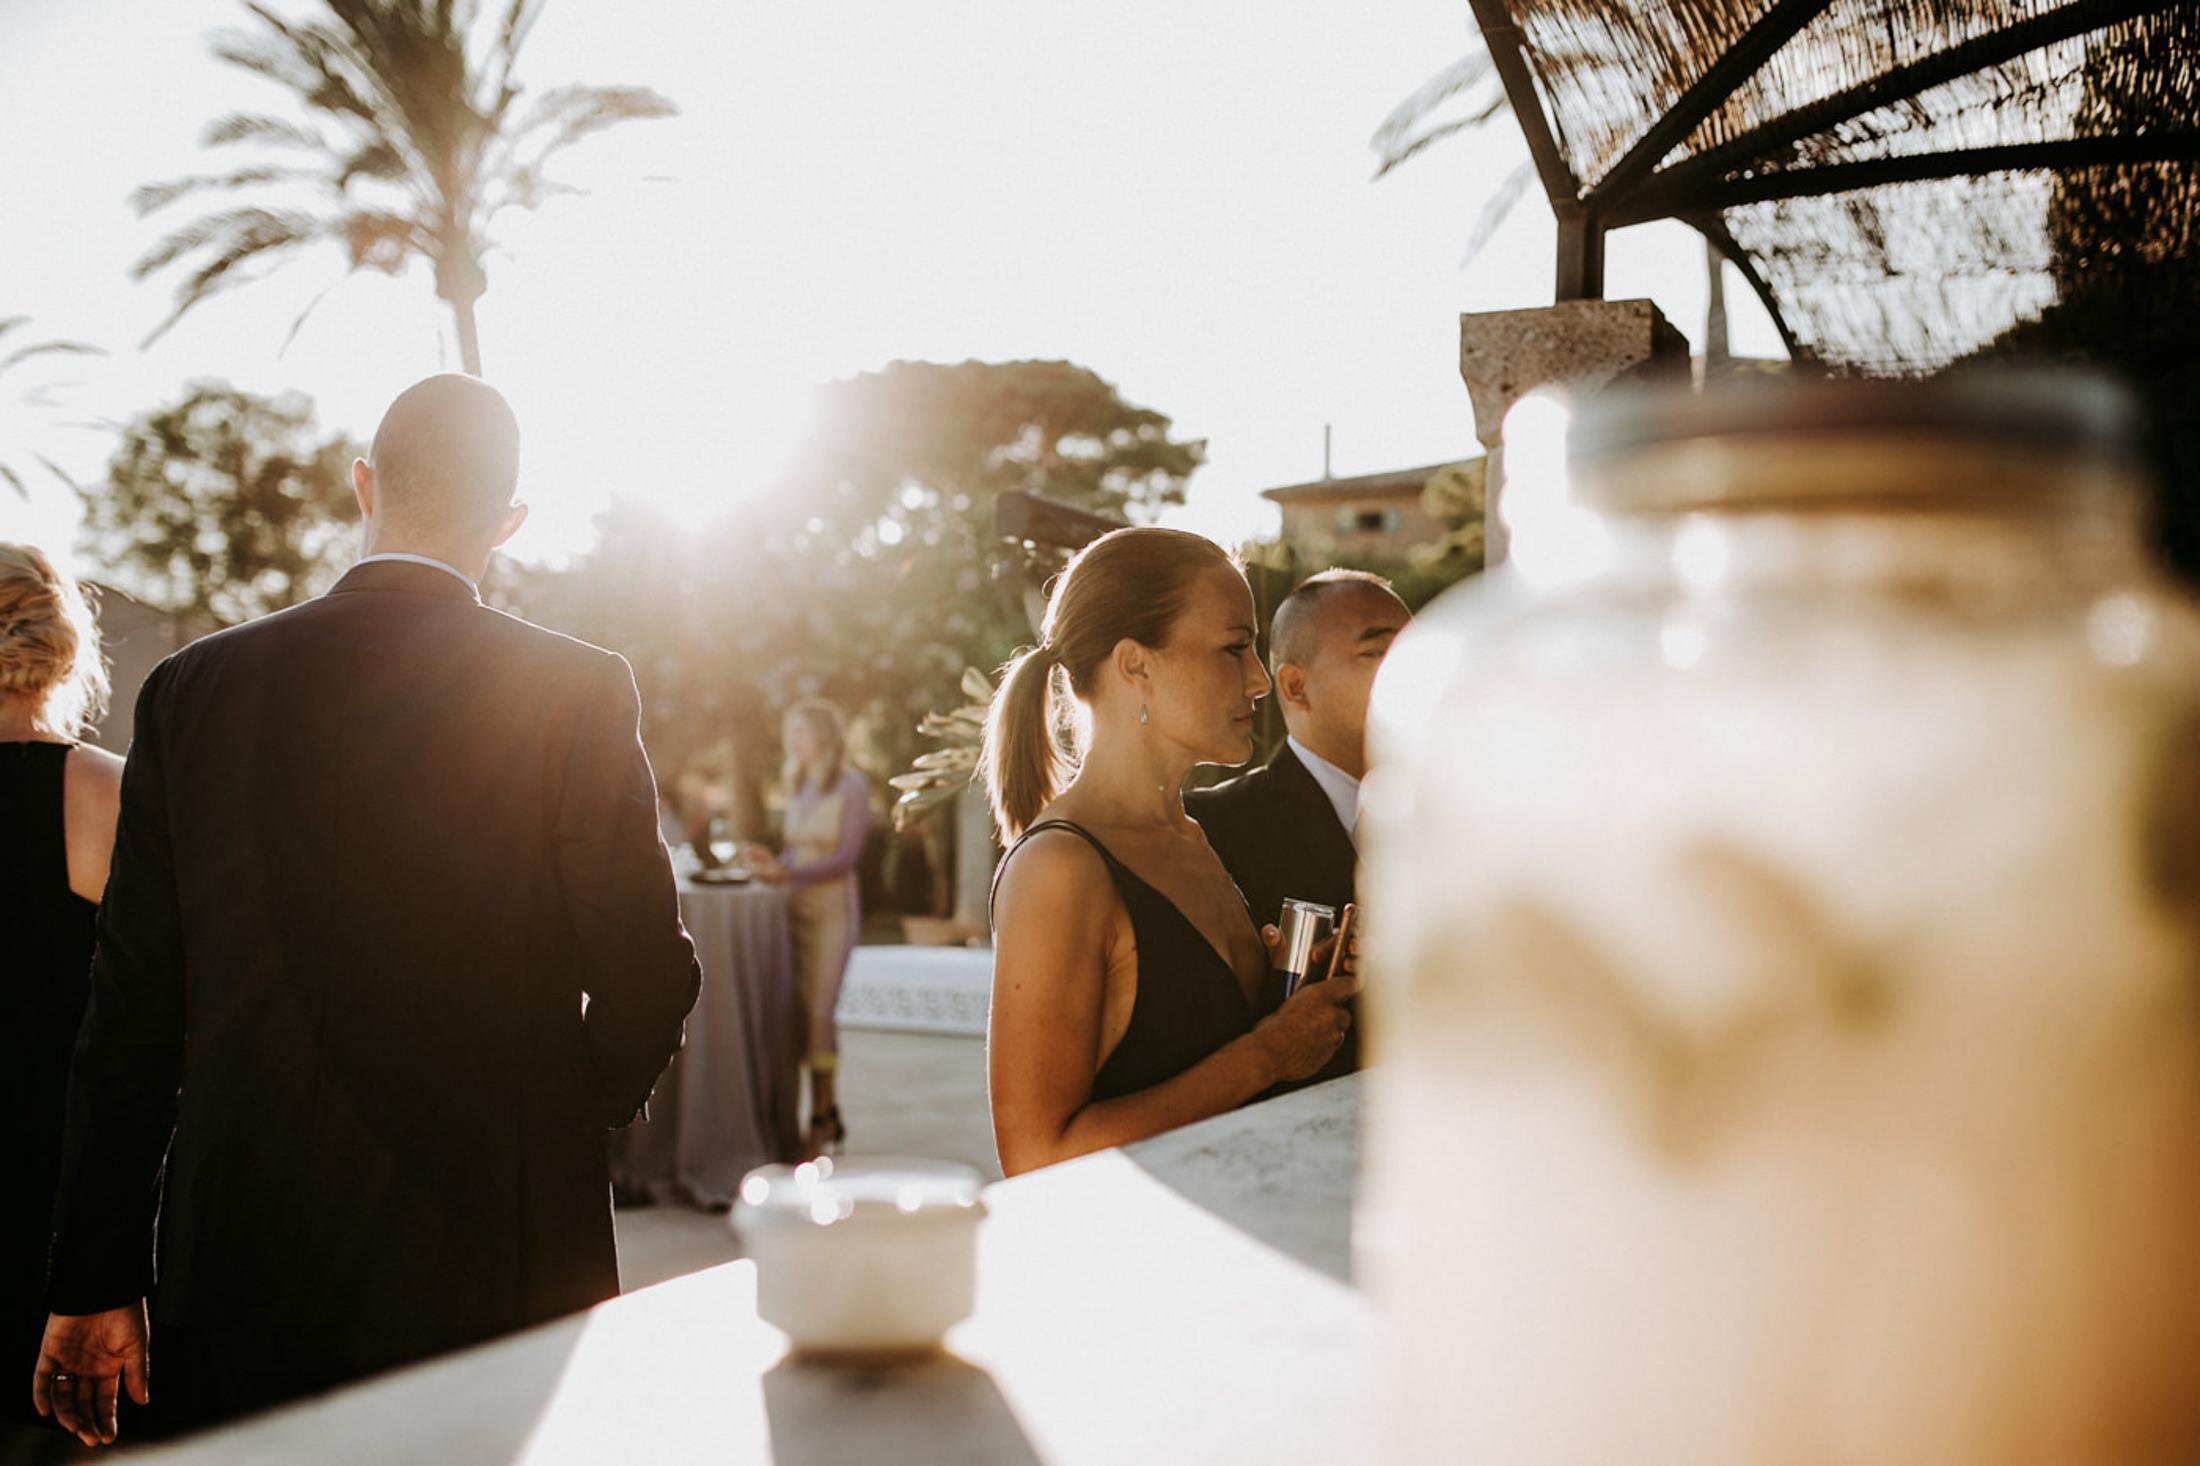 Wedding_Photographer_Mallorca_Daniela-Marquardt_Photography_New_York_Iceland_Tuscany_Santorini_Portugal_Austria_Bavaria_Elopement_Hochzeitsfotograf_AntjeRajat2_118